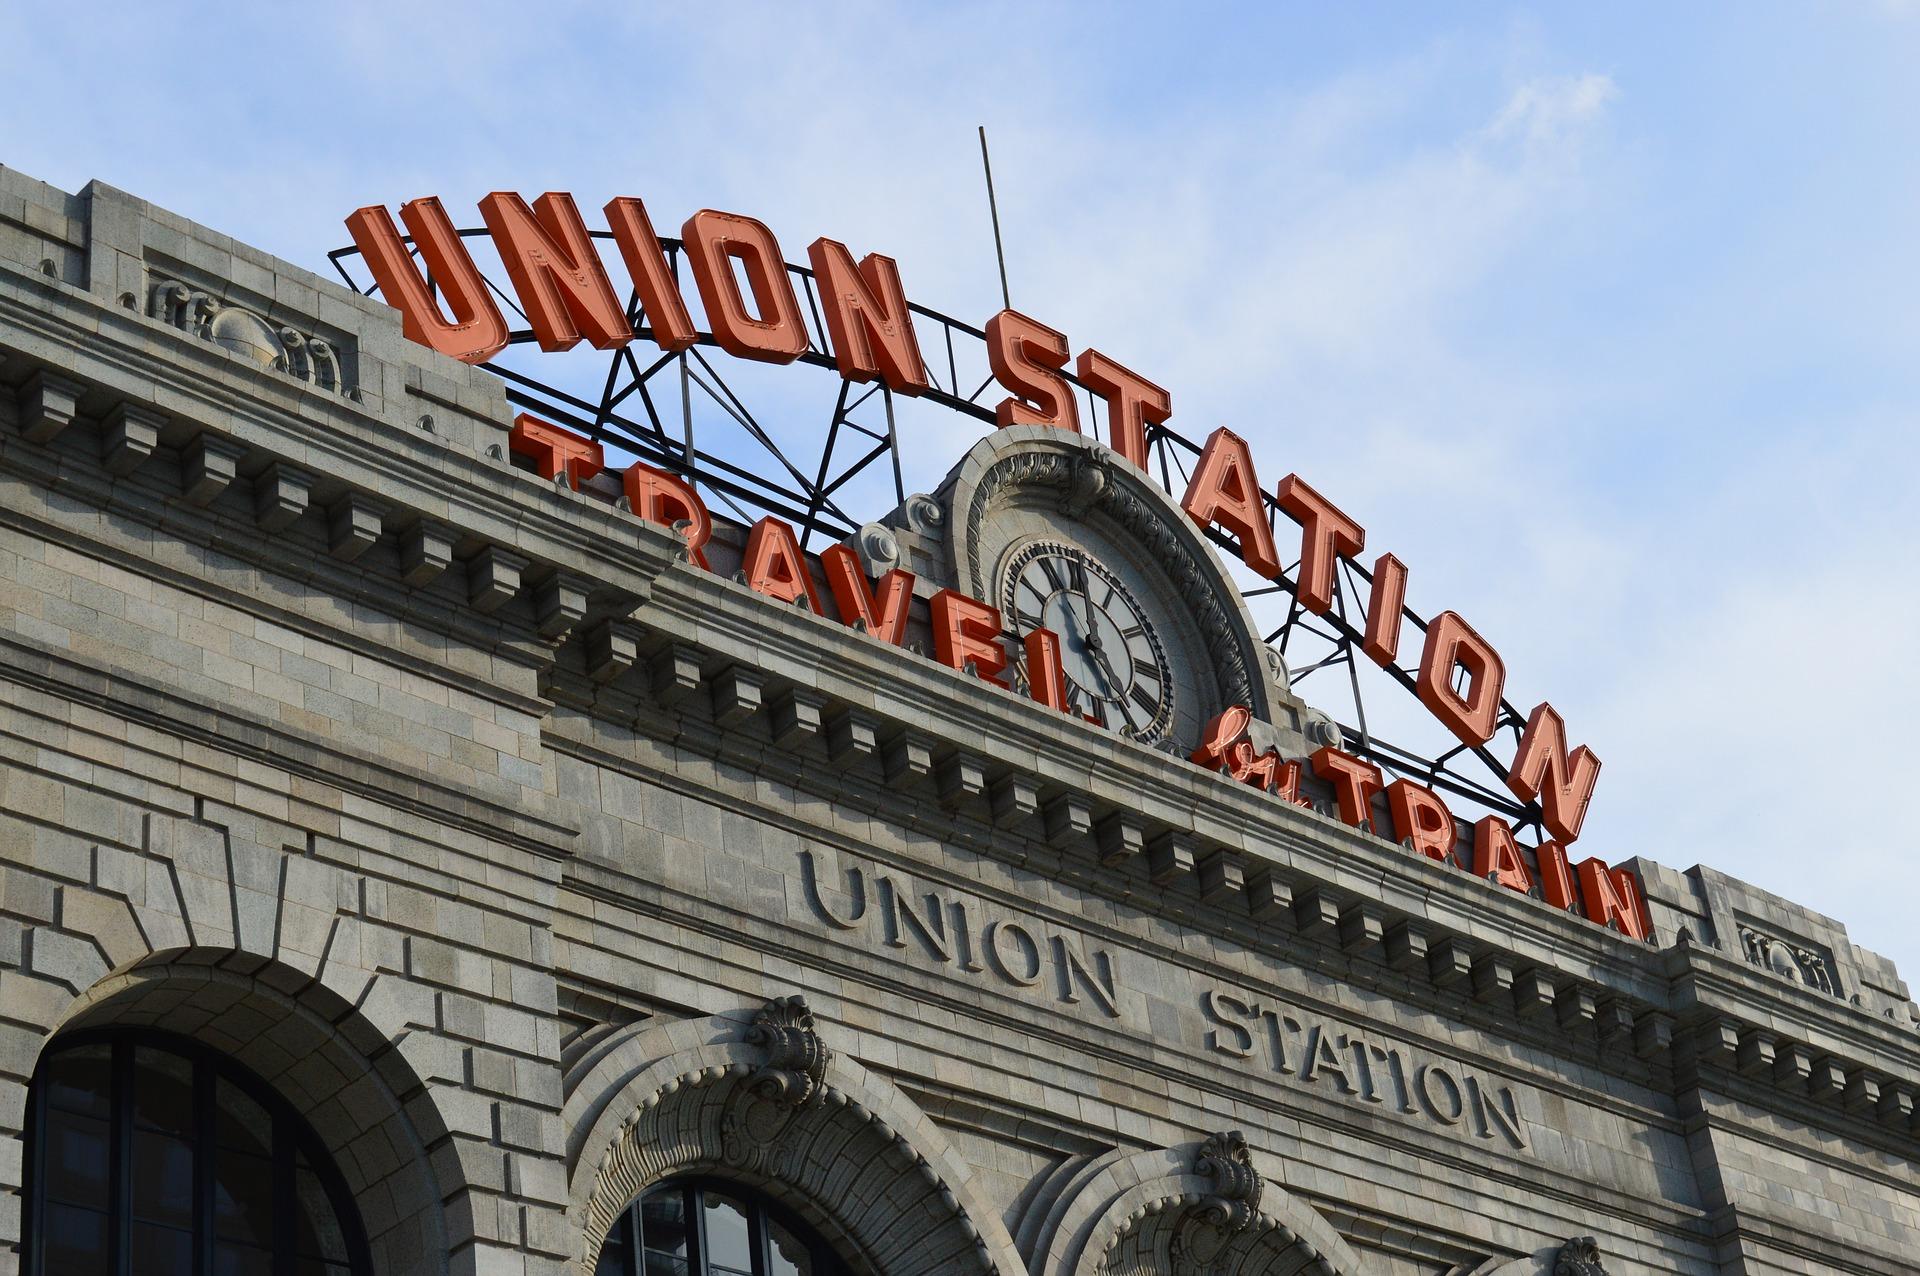 union-station-980887_1920.jpg